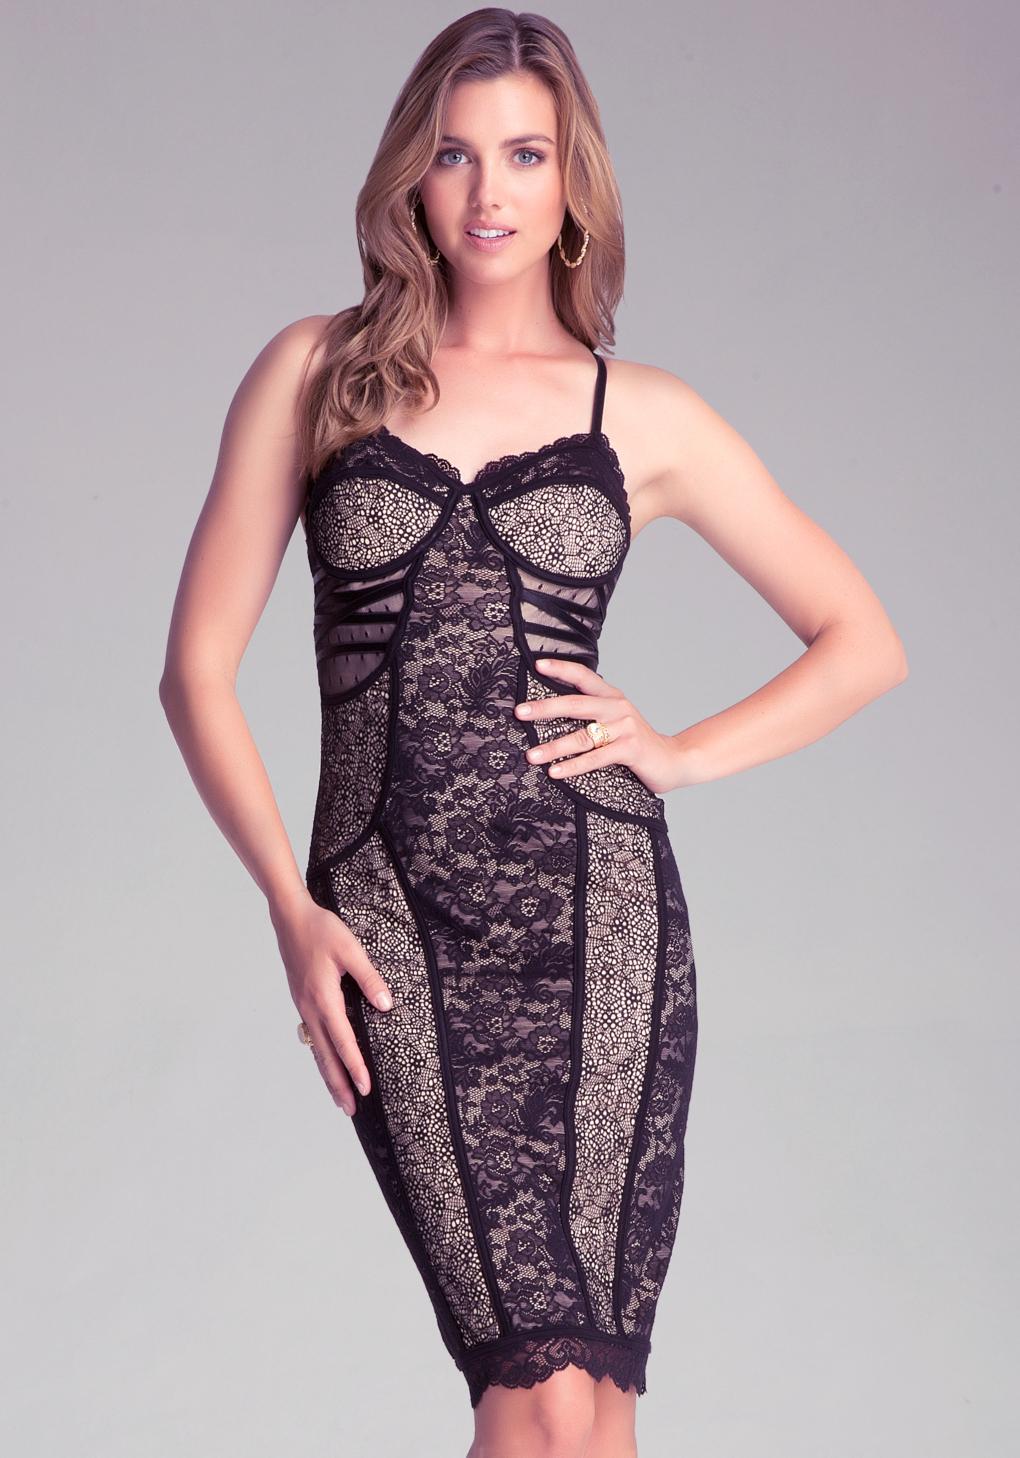 Bebe black one shoulder mixed lace dress